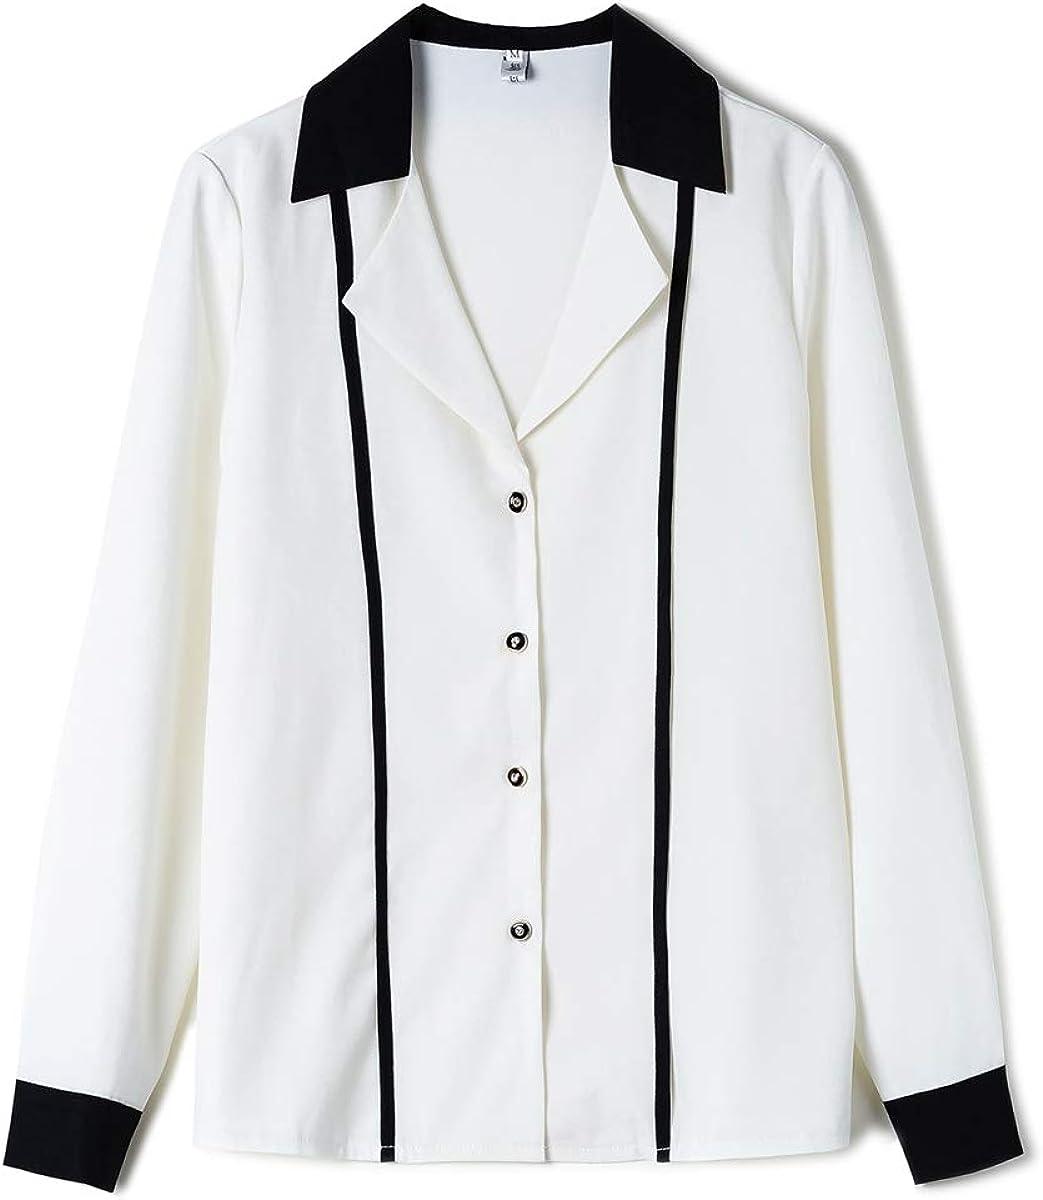 Women Notch Lapel V Neck Chiffon Button Down Blouse Long Sleeve Office OL Shirt Tops